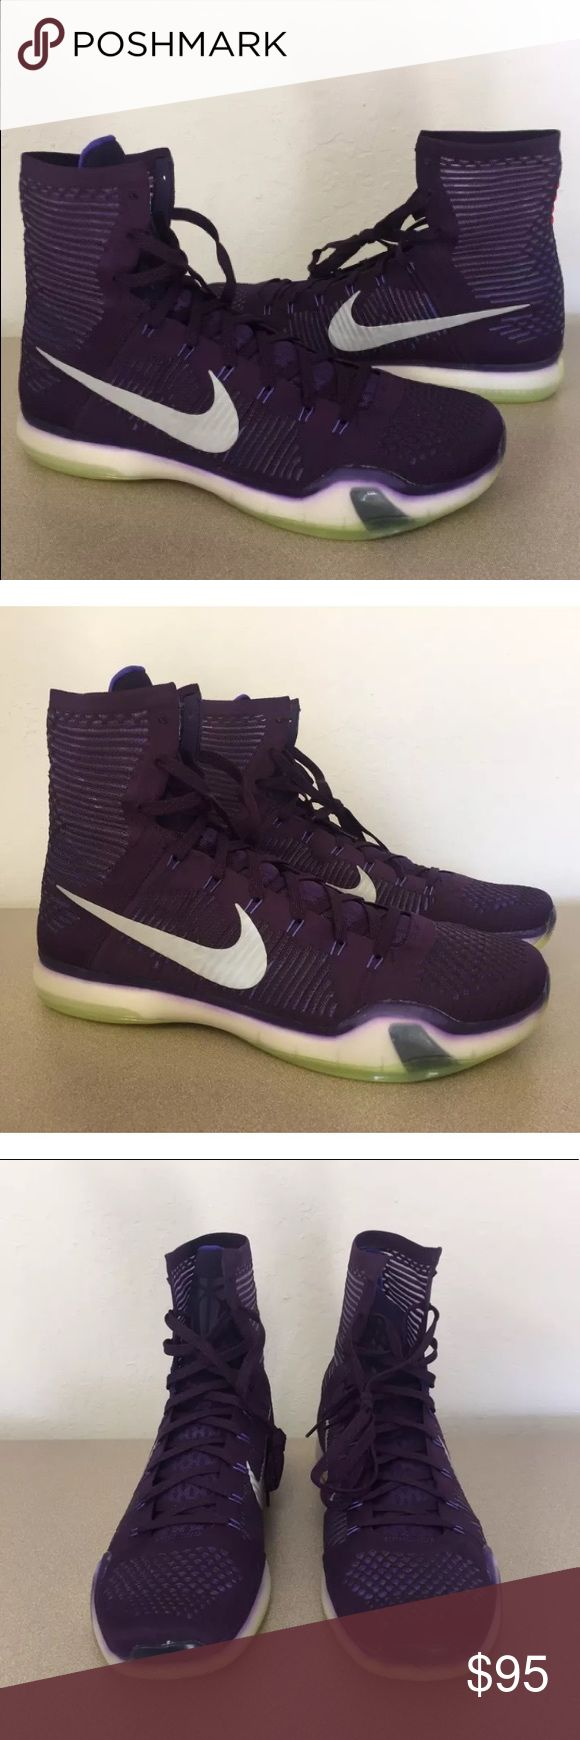 newest collection e3782 8d7bd Best 25+ Kobe bryant new shoes ideas on Pinterest   Kobe bryant dunk, Kobe  bryant 24 and Kobe bryant black mamba